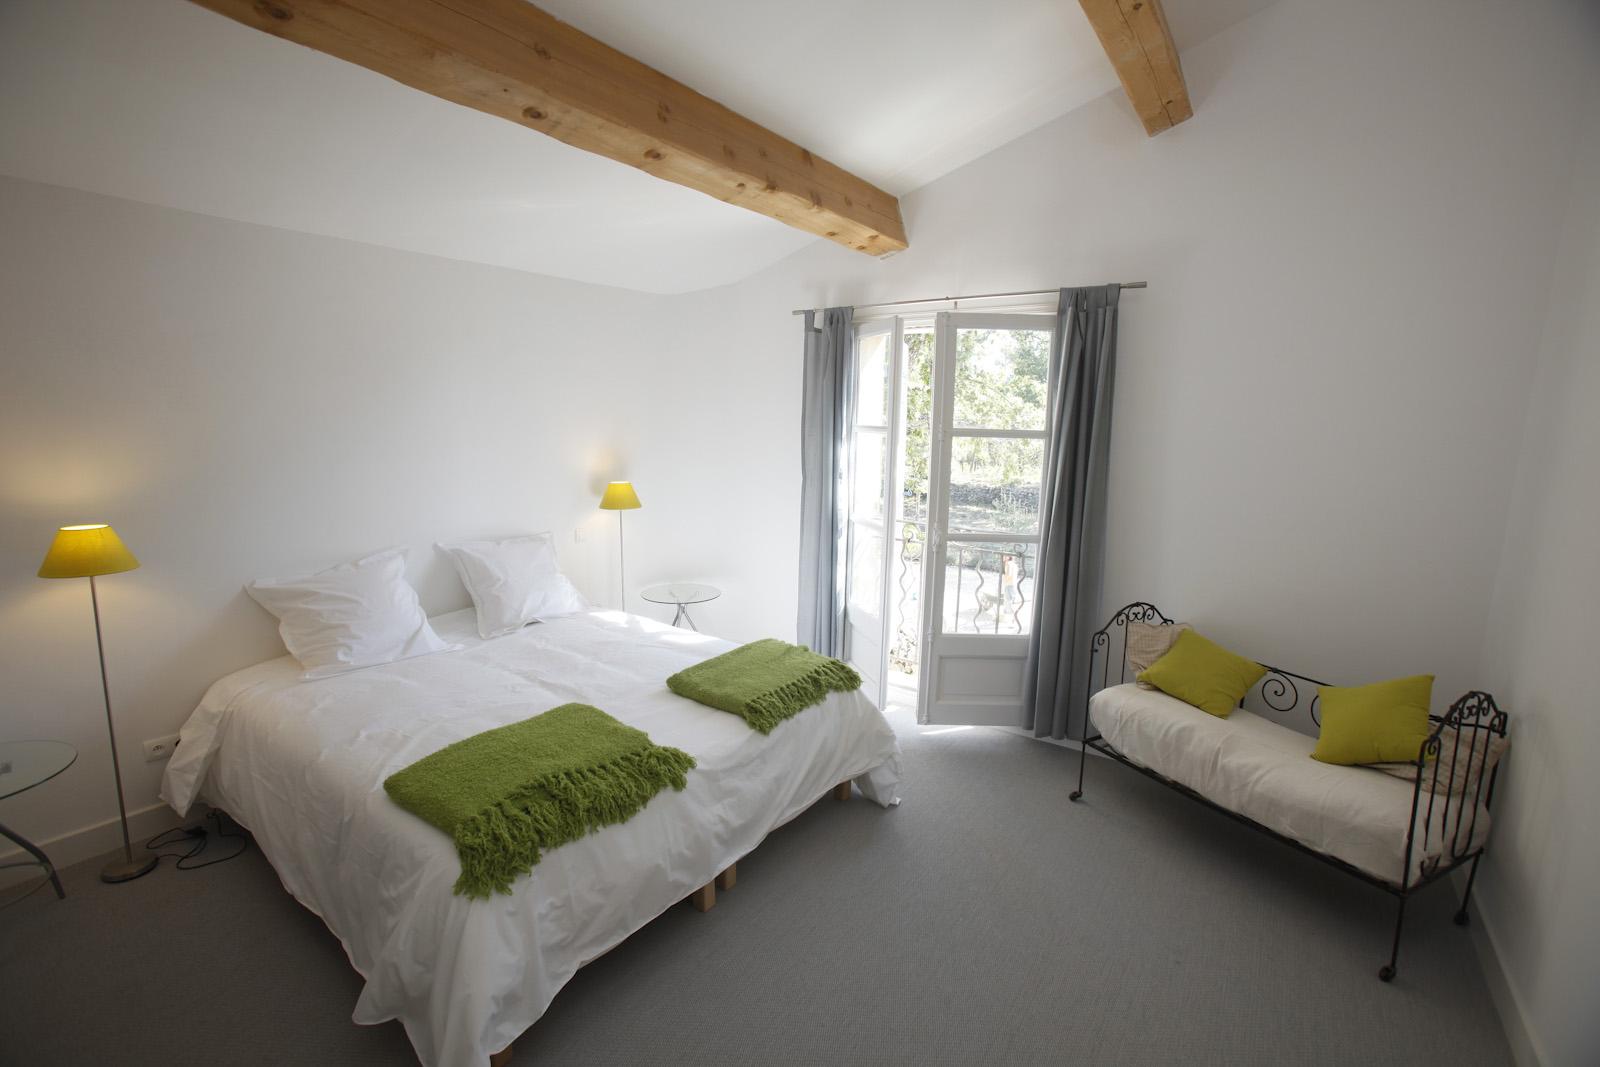 Maison d hote paca excellent chambres duhudtes naturistes for Chambre d hotes paca